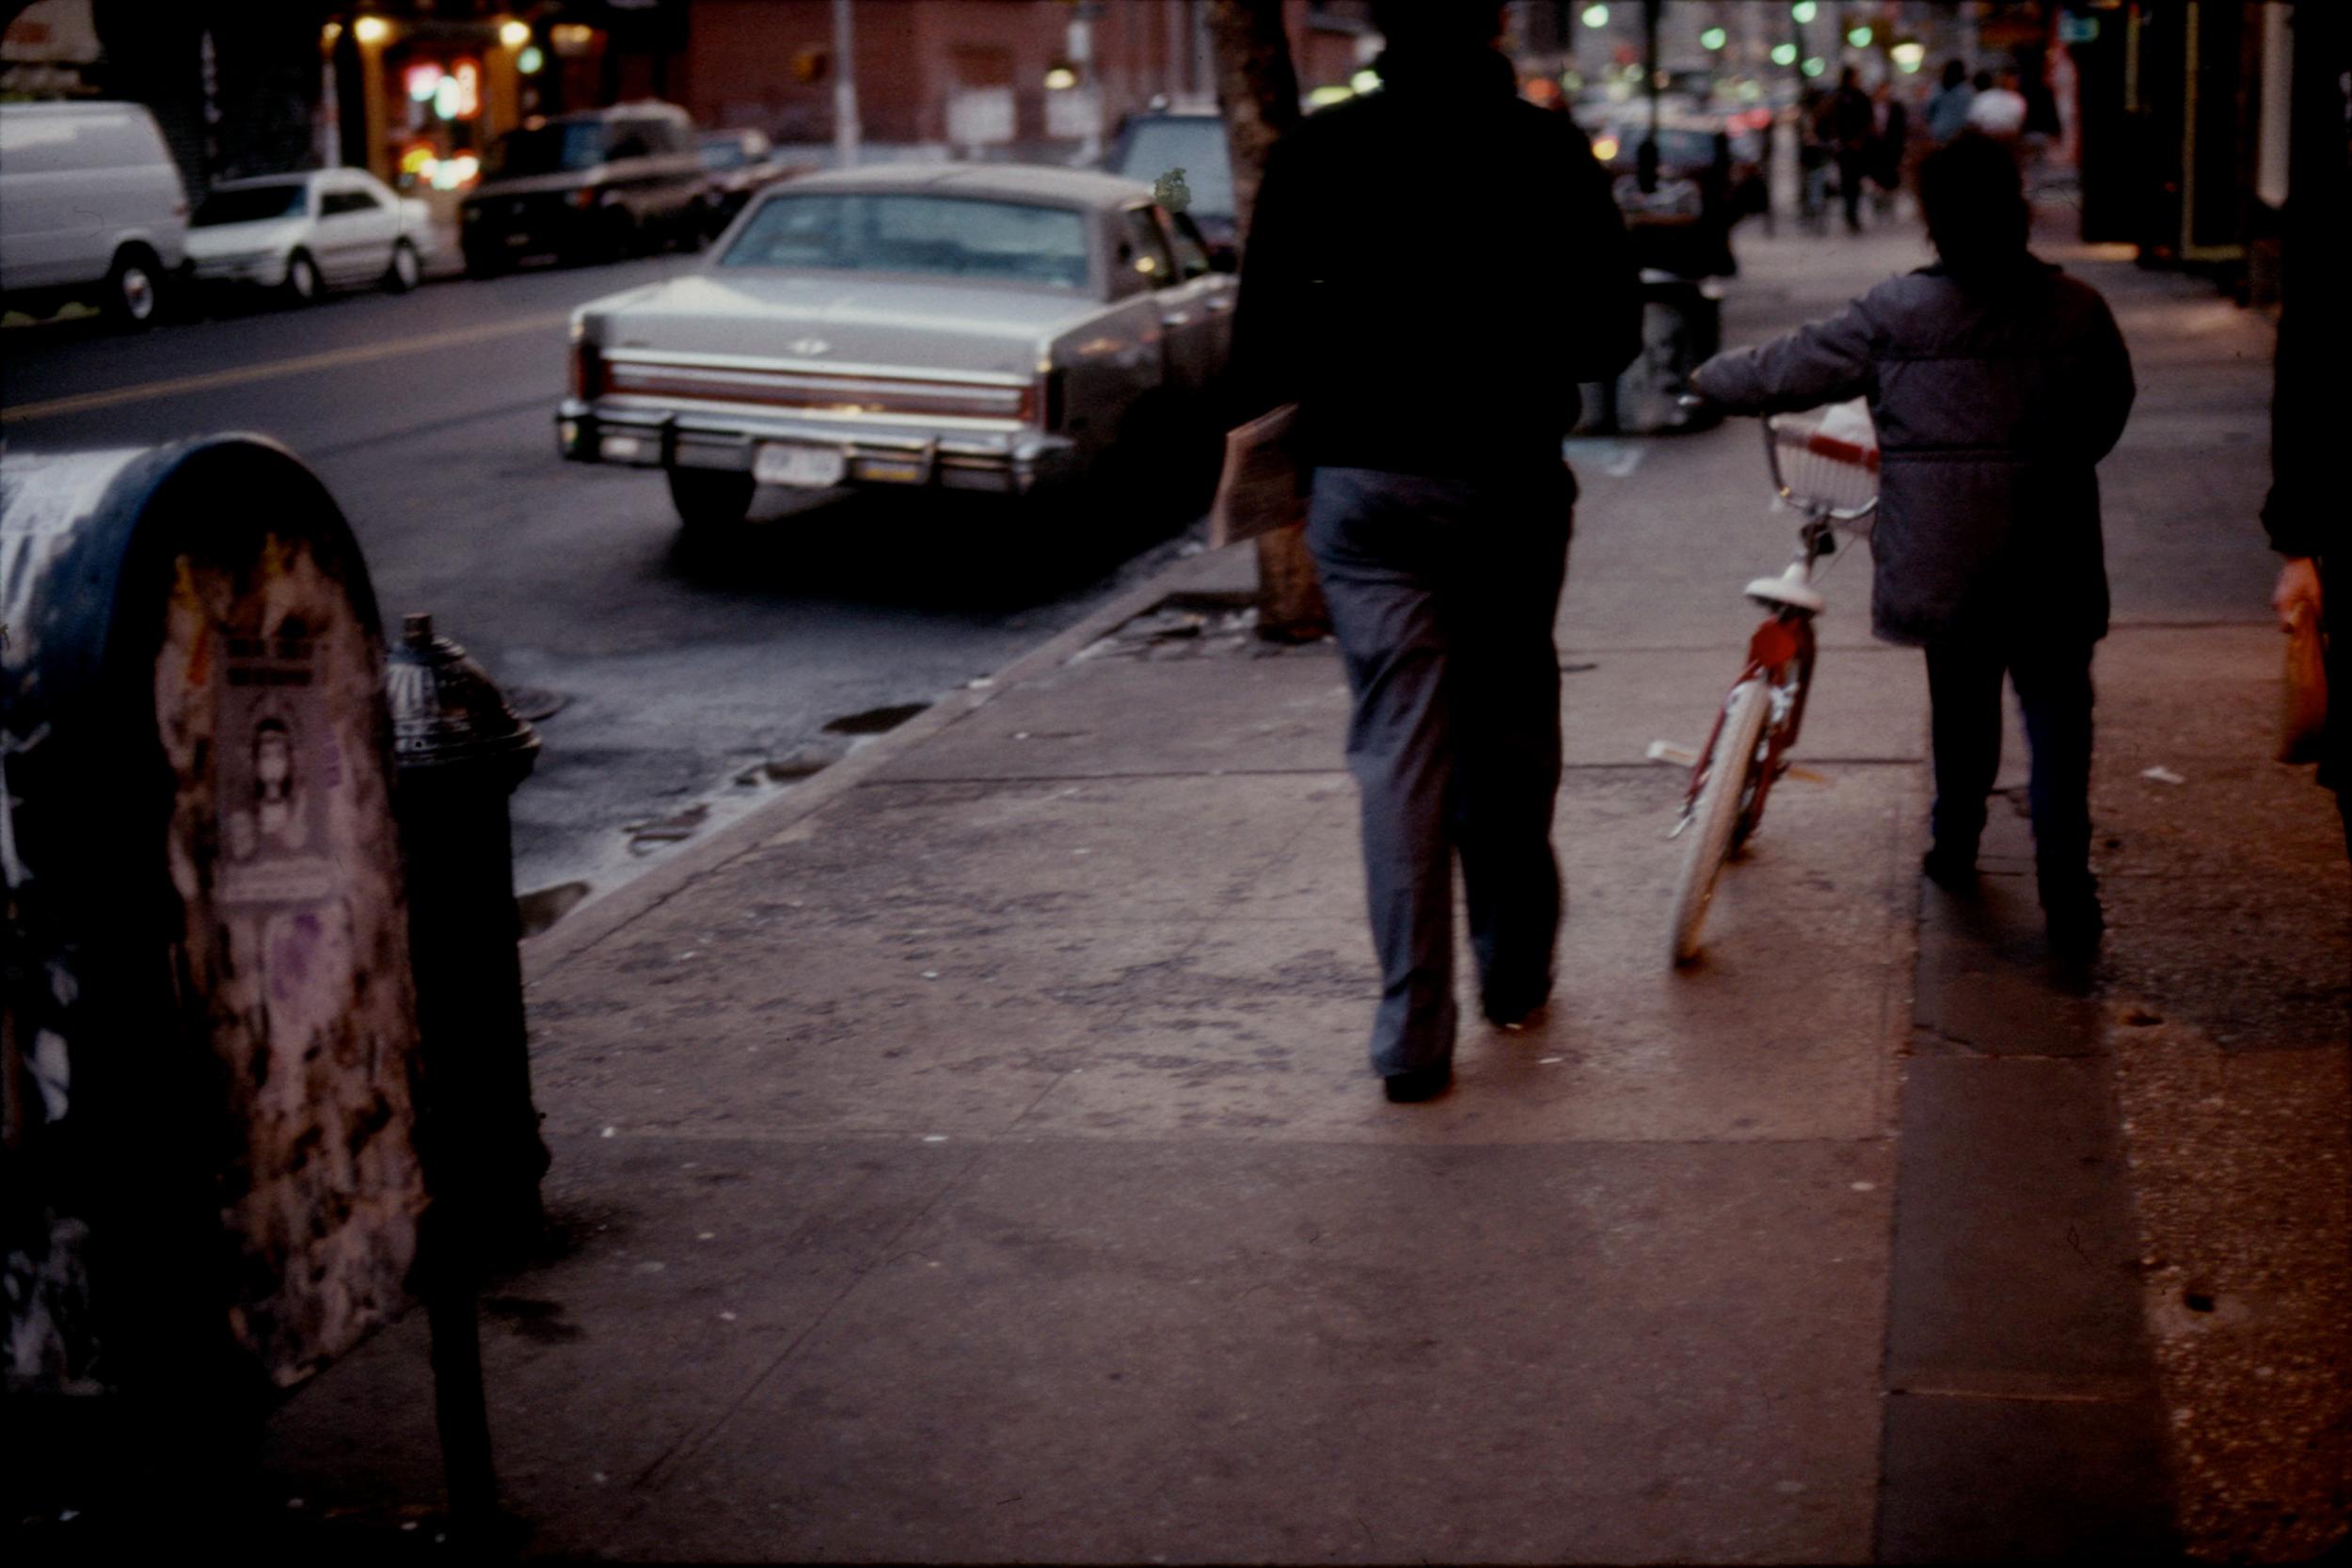 Probably East Village, c 1989